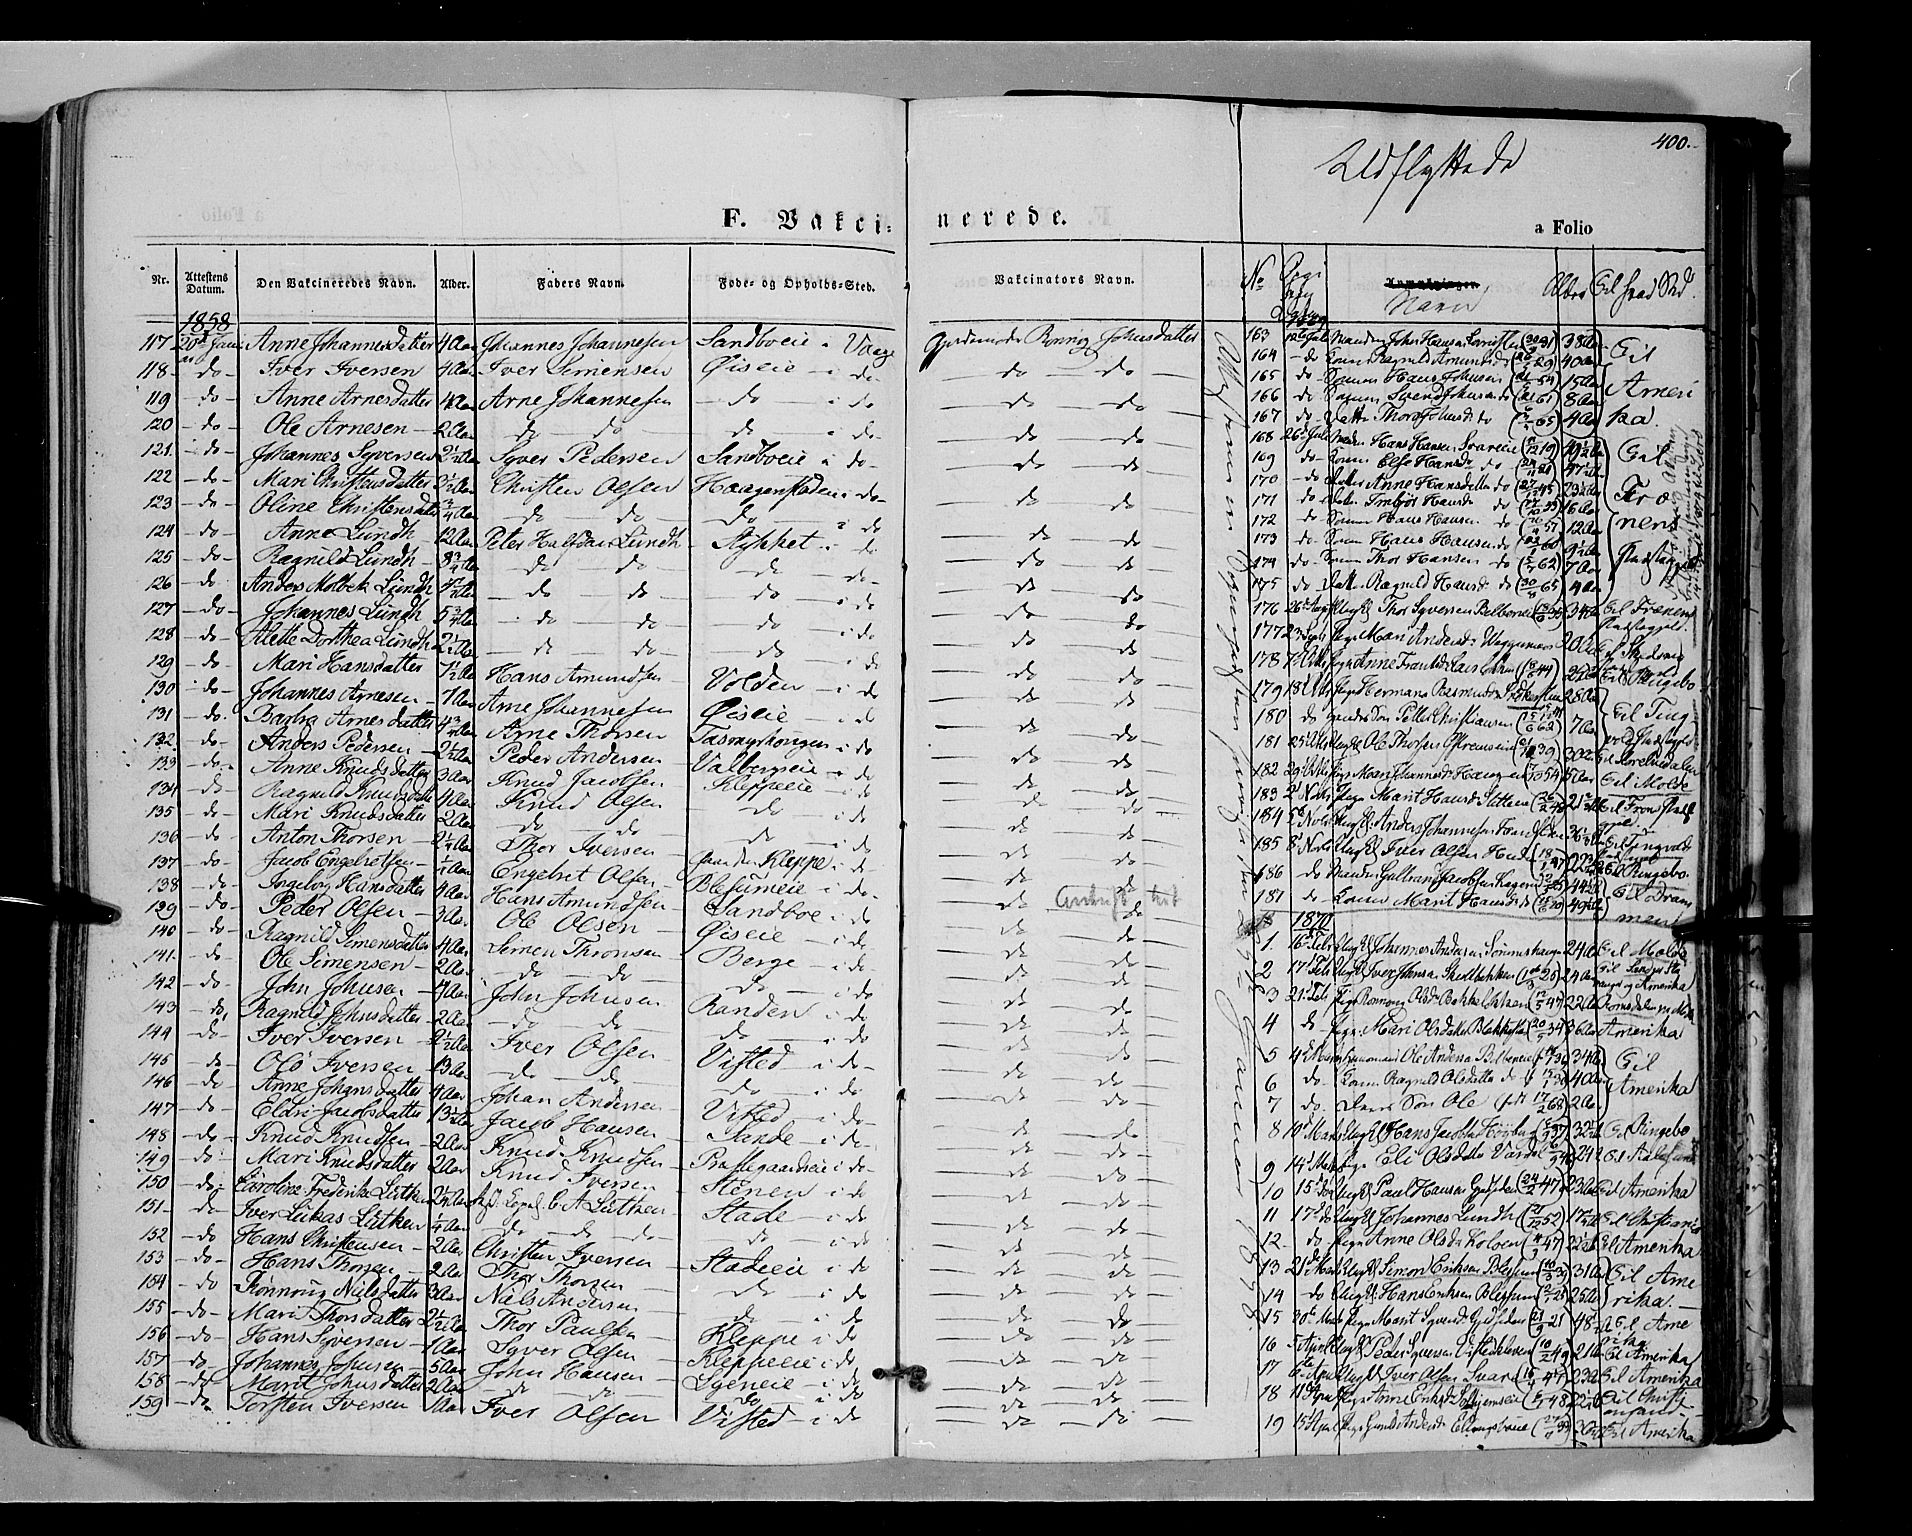 SAH, Vågå prestekontor, Ministerialbok nr. 6 /1, 1856-1872, s. 400